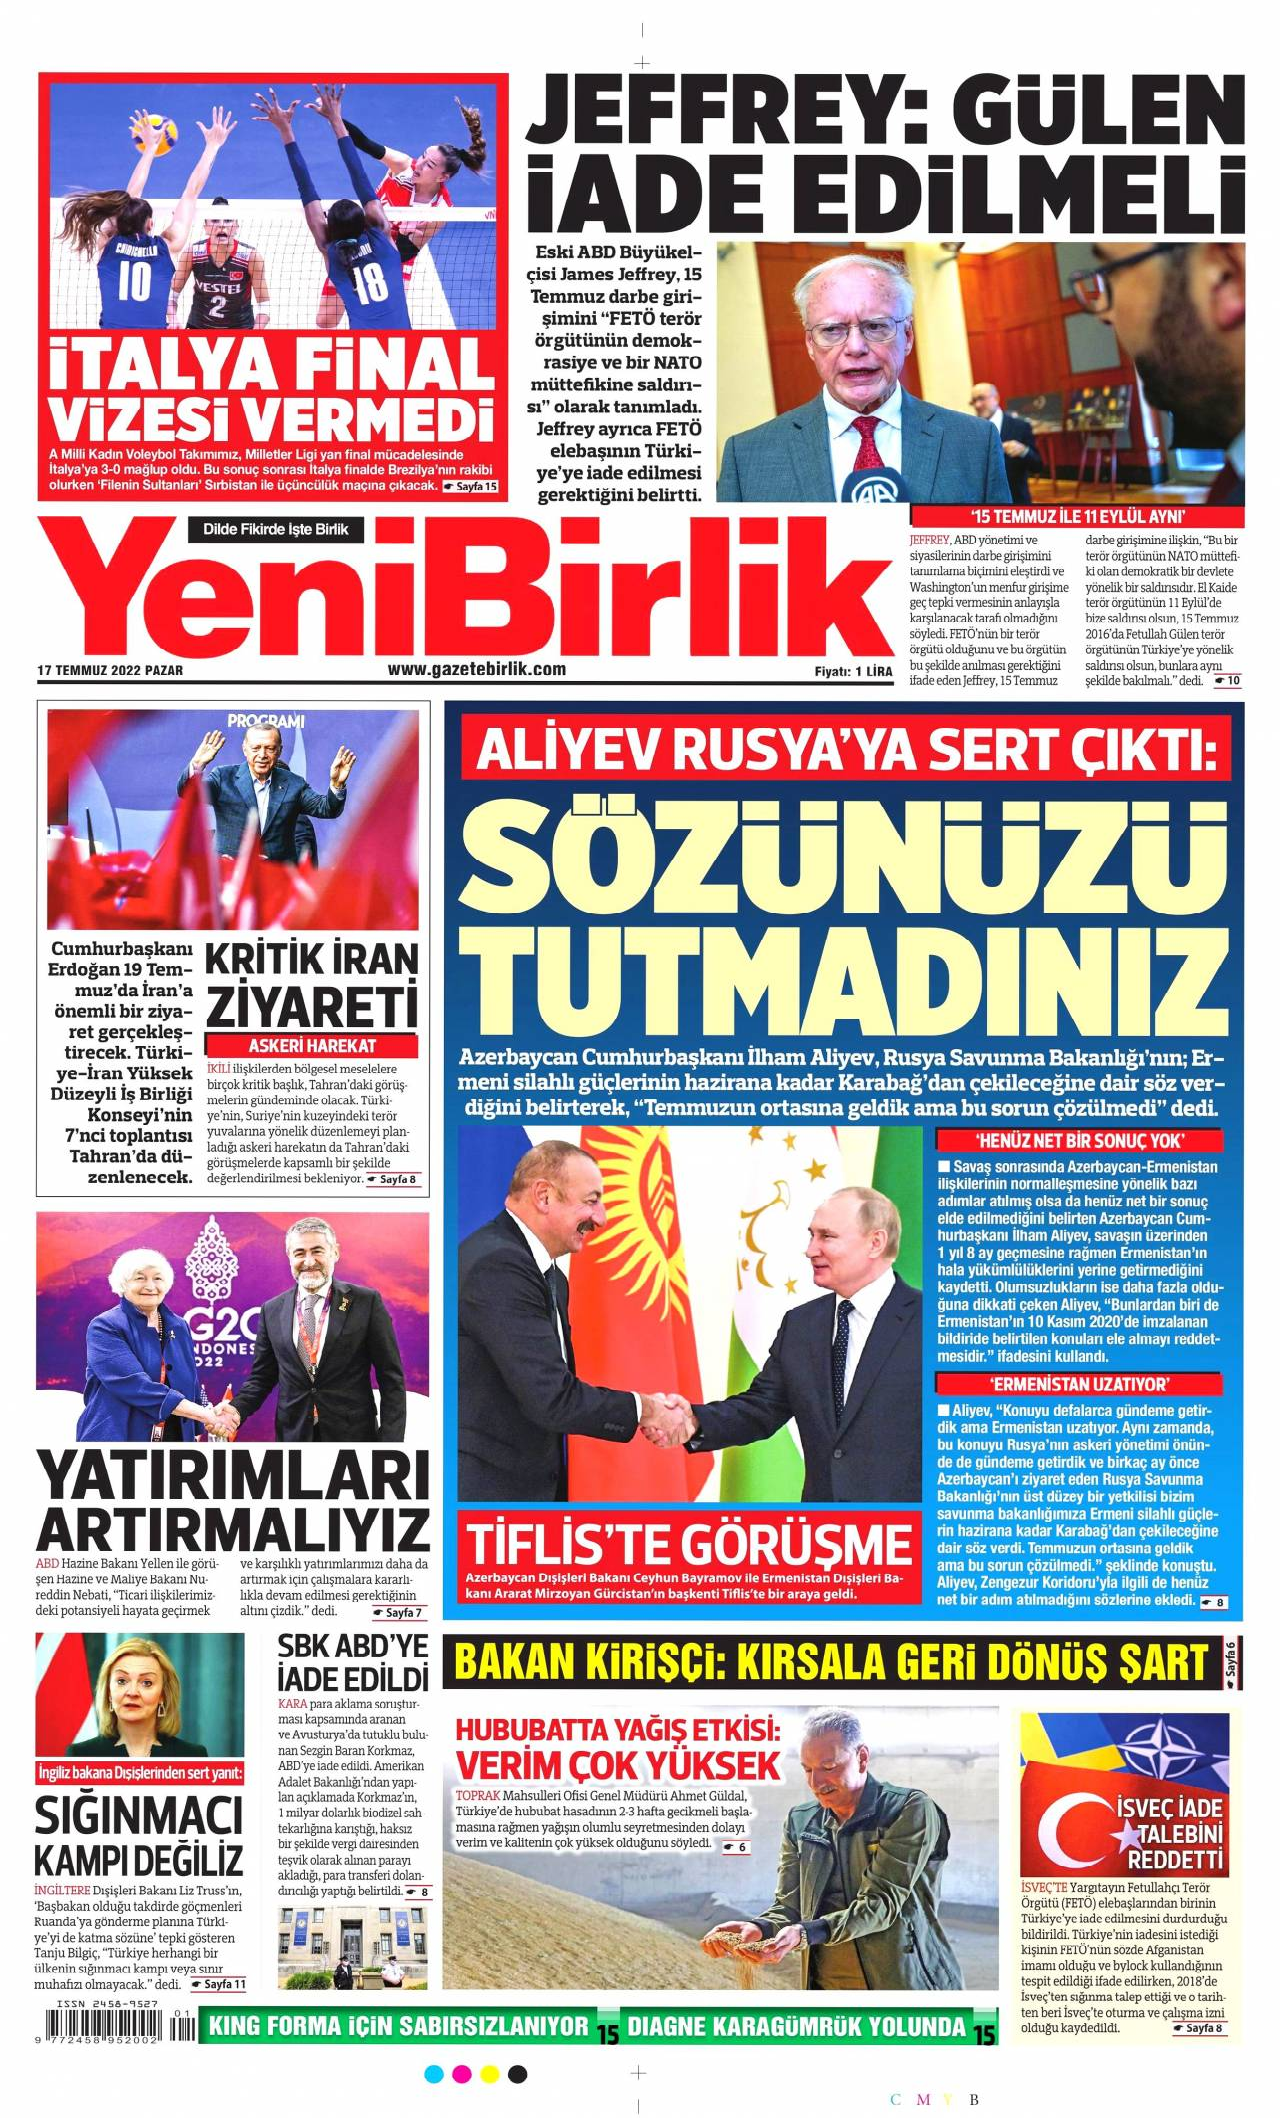 Gazete Manşetleri | Gazete Keyfi, Gazeteler, Gazete Oku